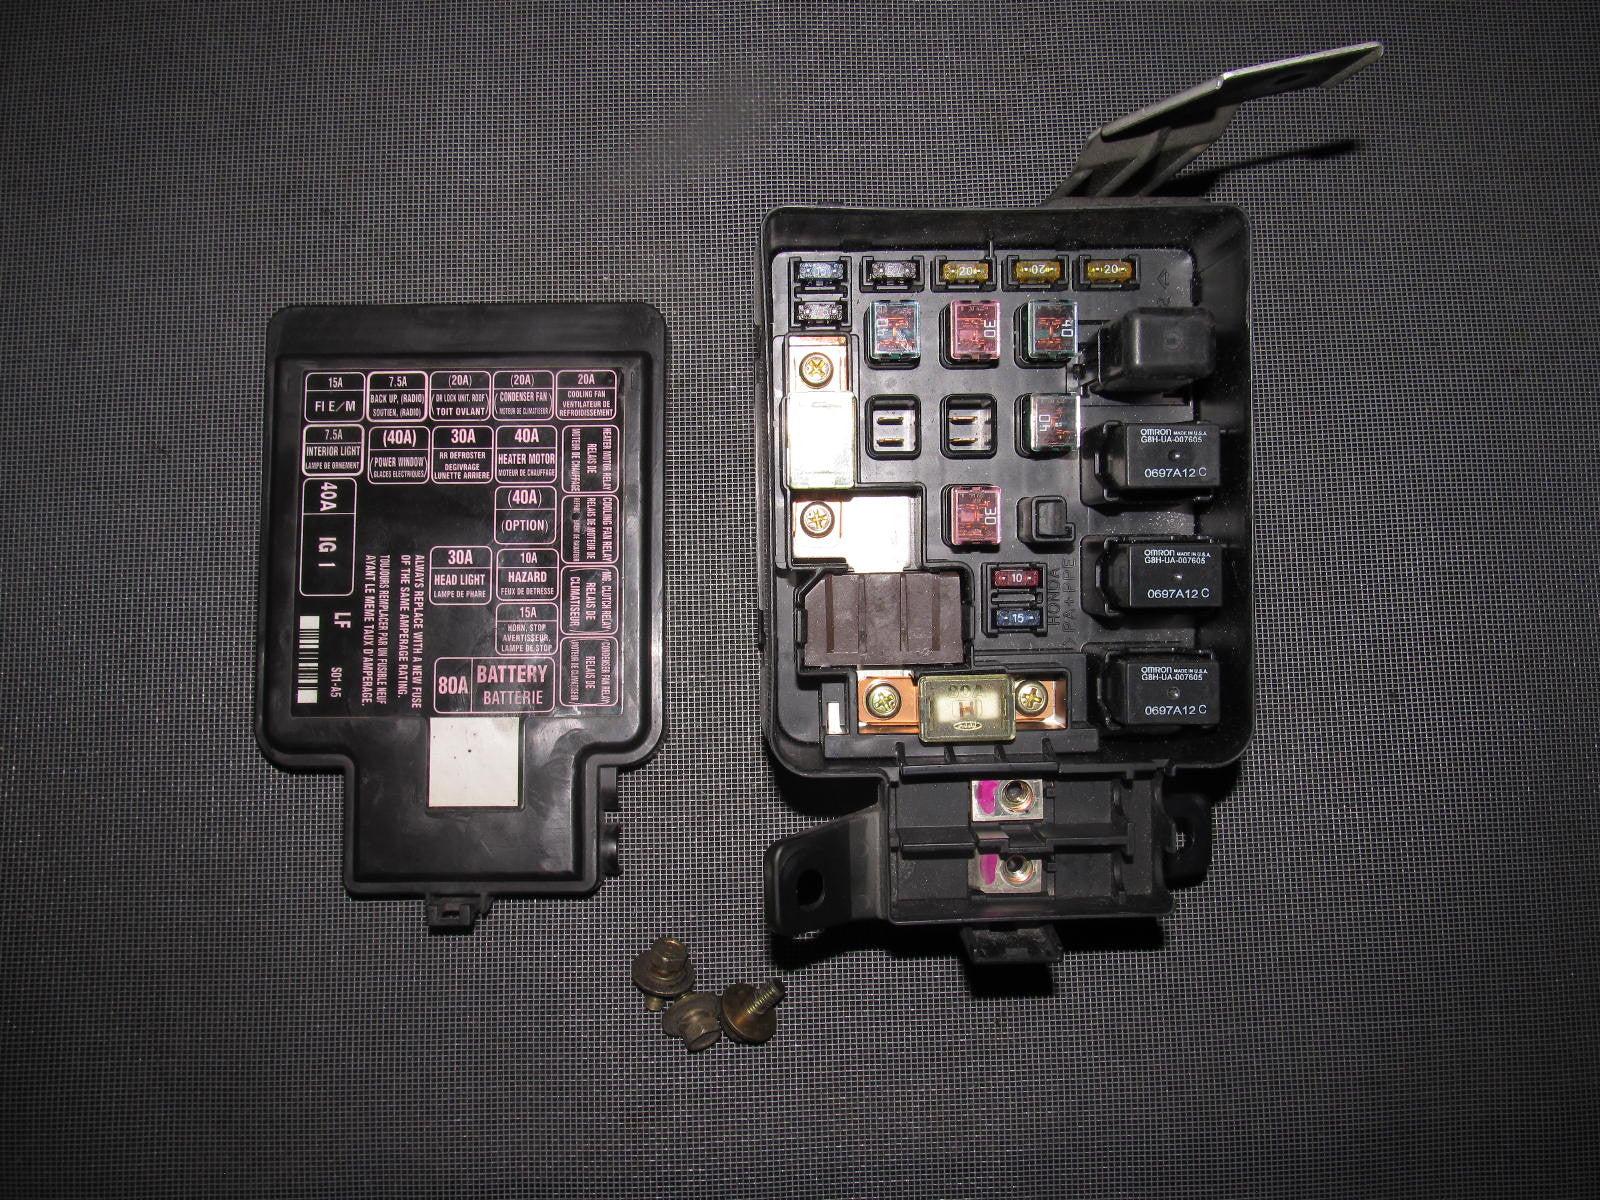 96 97 98 99 00 honda civic oem engine fuse box autopartone com 1998 honda accord [ 1600 x 1200 Pixel ]